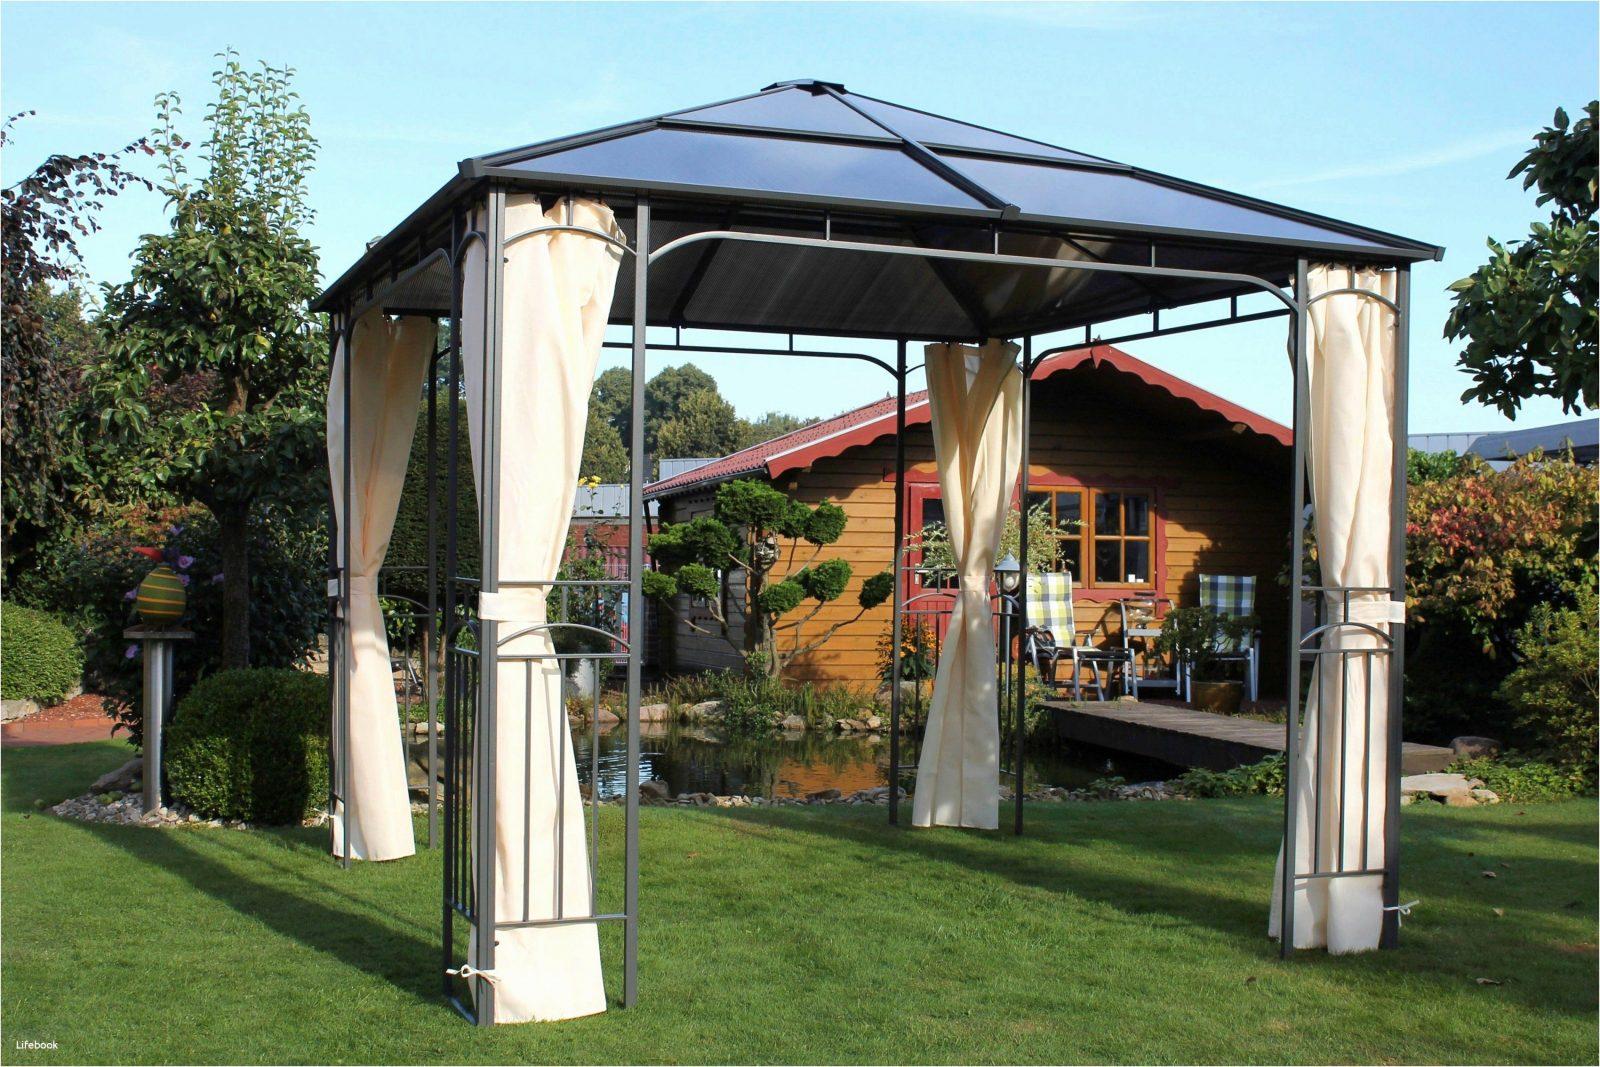 Ersatzdach Pavillon 3×3 Ikea Frisch – Litebook von Pavillon 3X3 Wasserdicht Bauhaus Photo